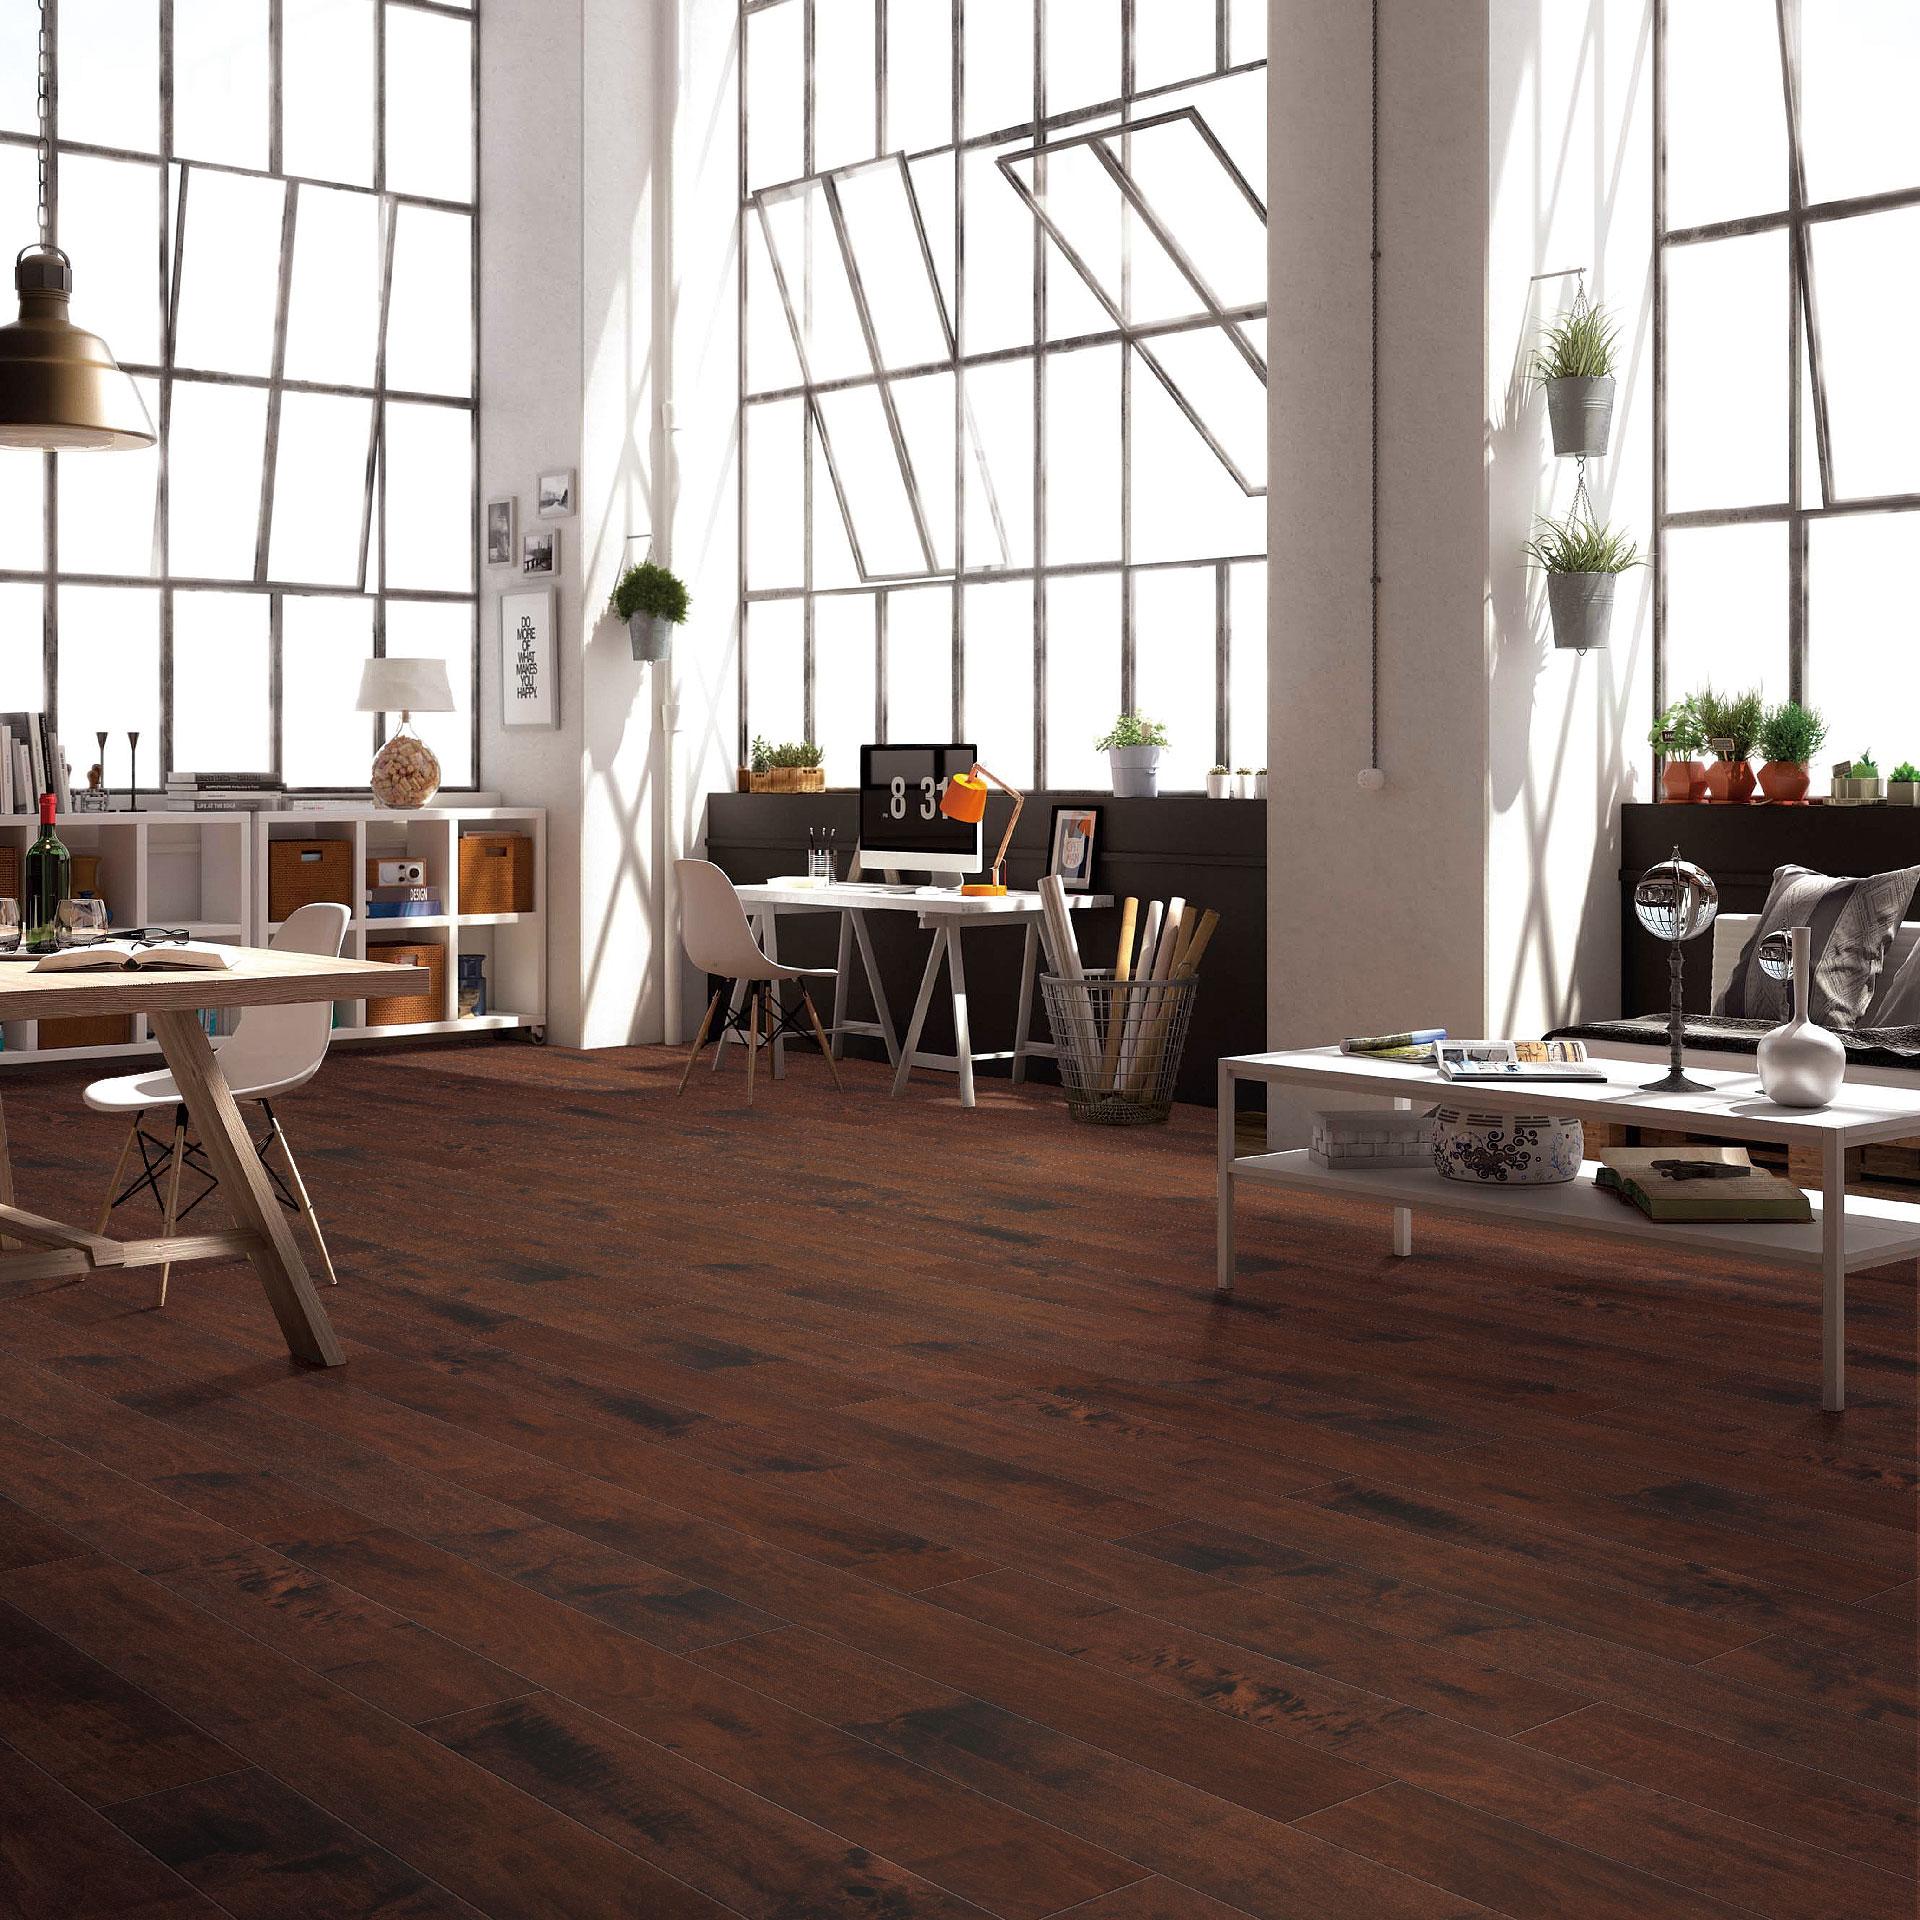 Espresso Acacia Wr Parkay Floors